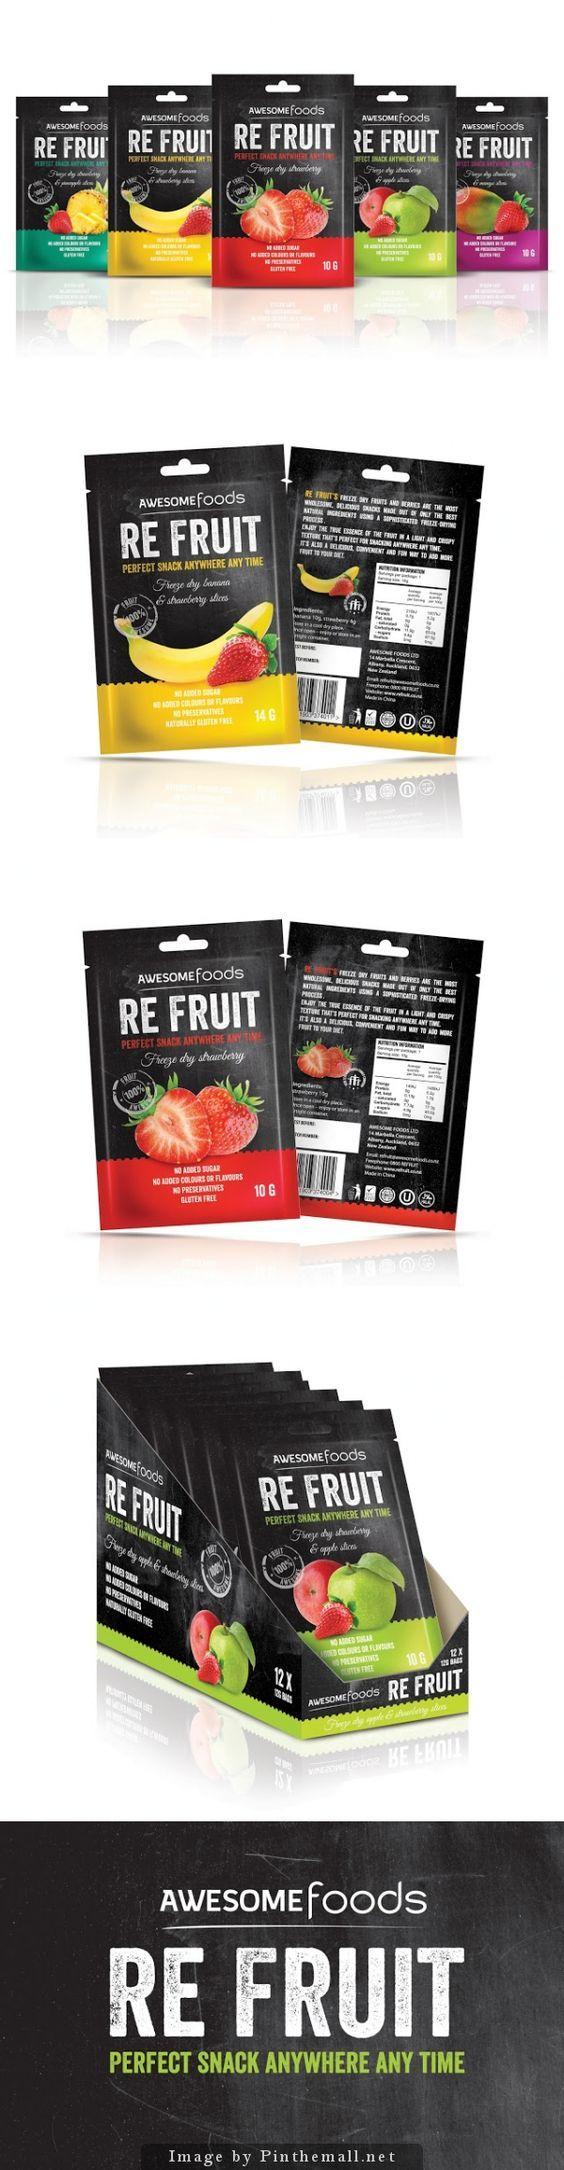 RE #FRUIT, Designer: Marcin Regucki - on Packaging of the World: